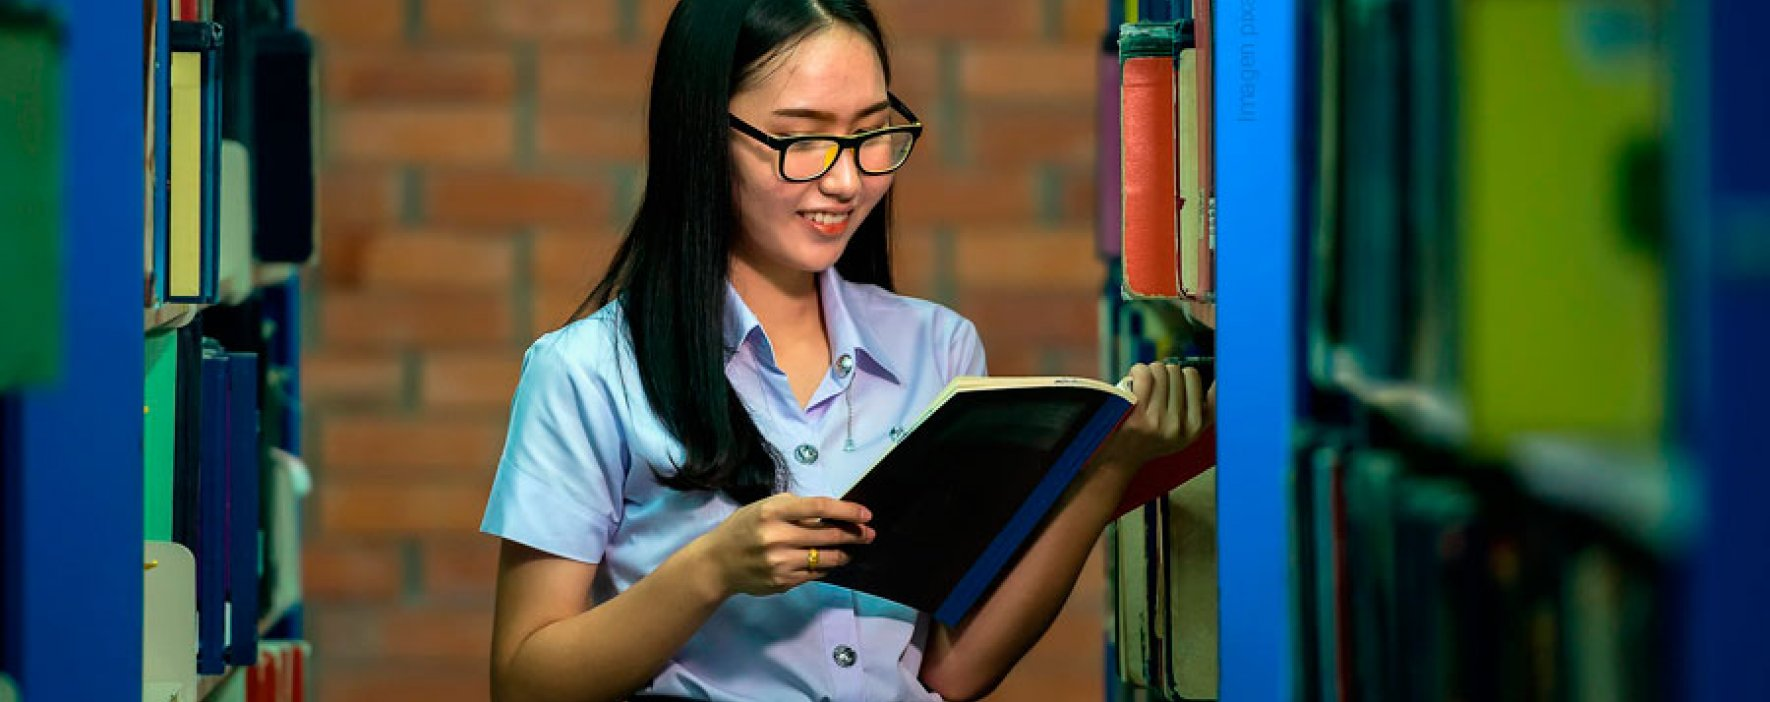 Convocatoria abierta: participe del programa de becas en Malasia